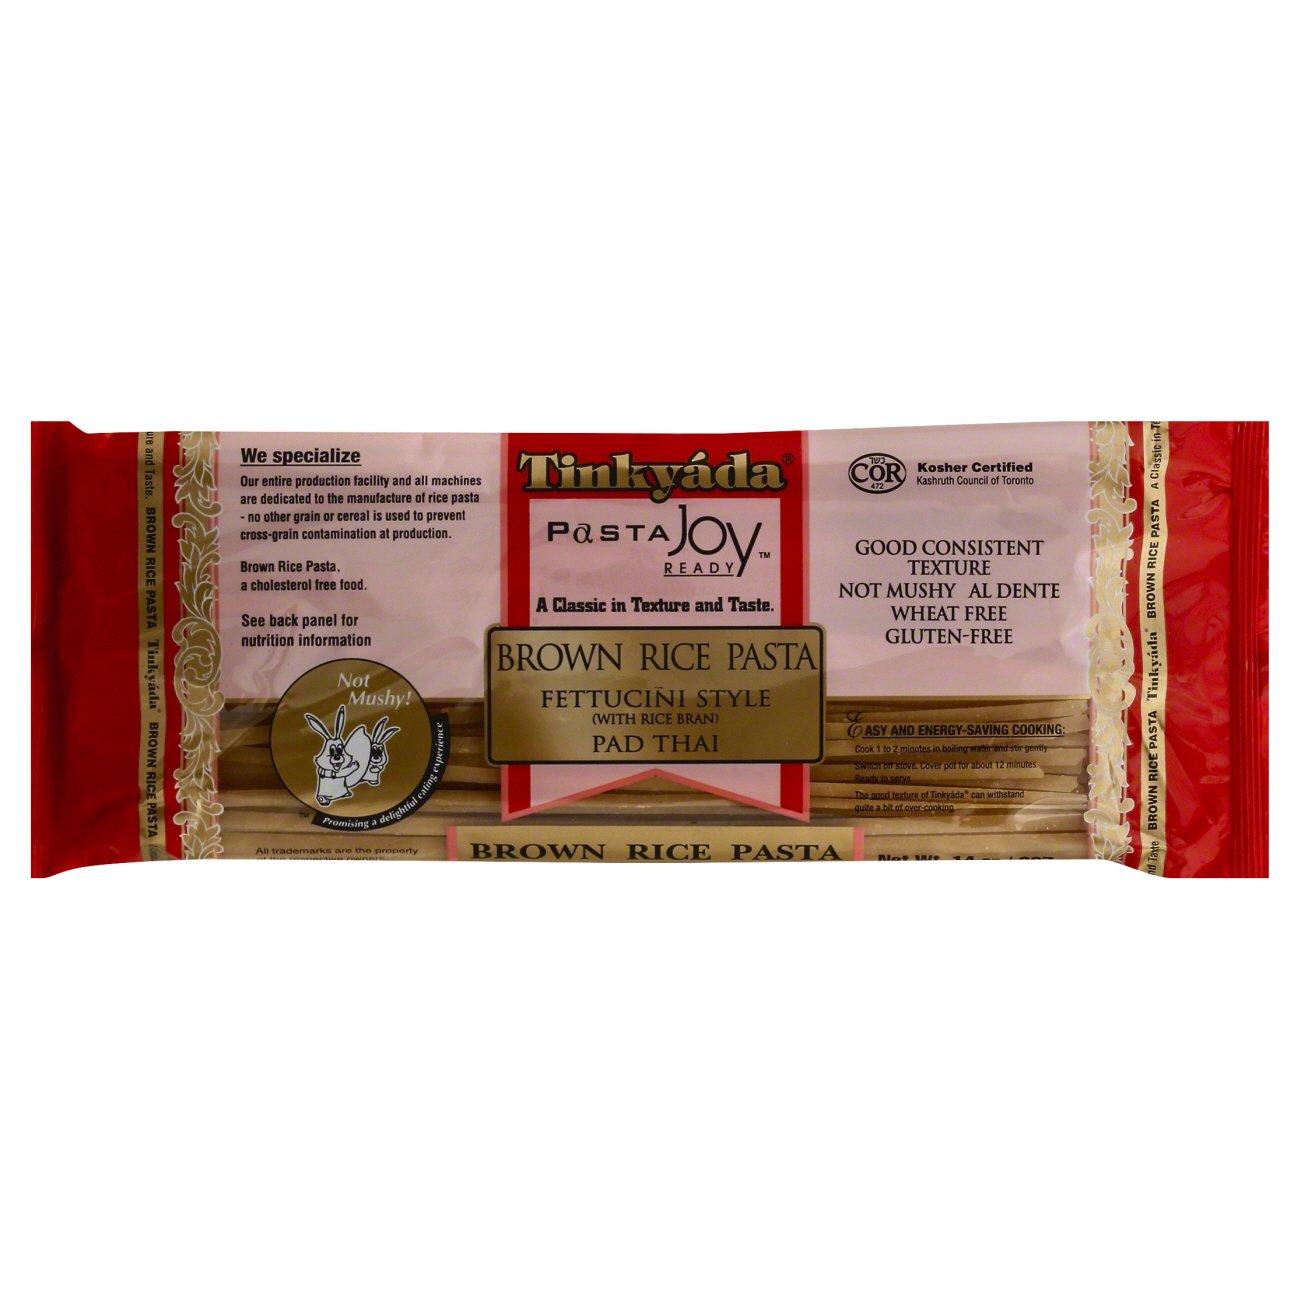 Tinkyada Fettuccini Style Pad Thai Brown Rice Pasta €� Shop Pasta At Heb